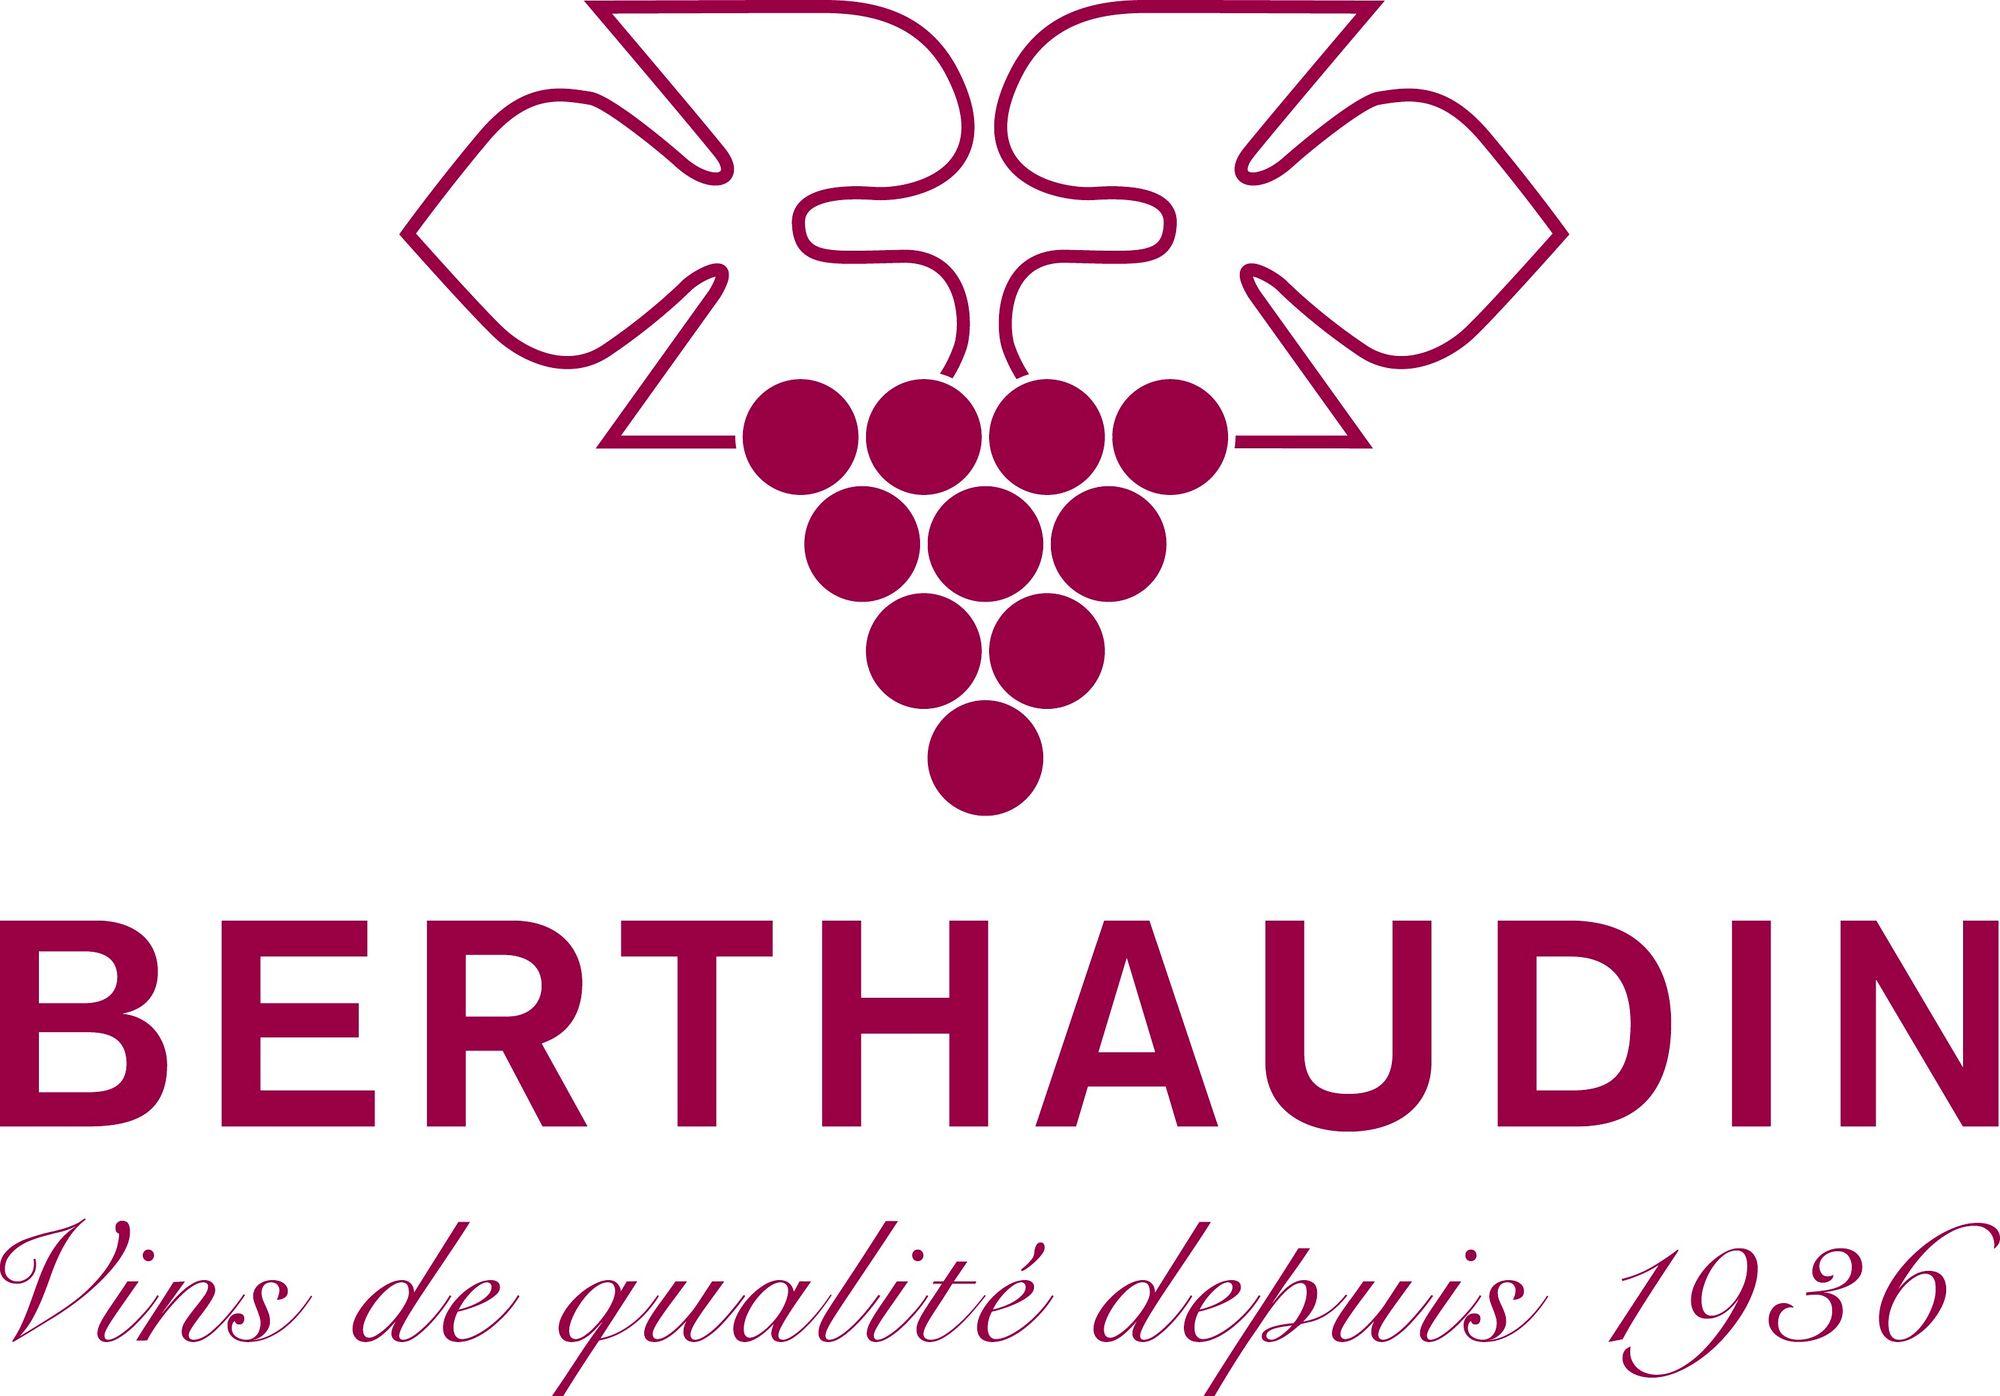 Berthaudin Vins